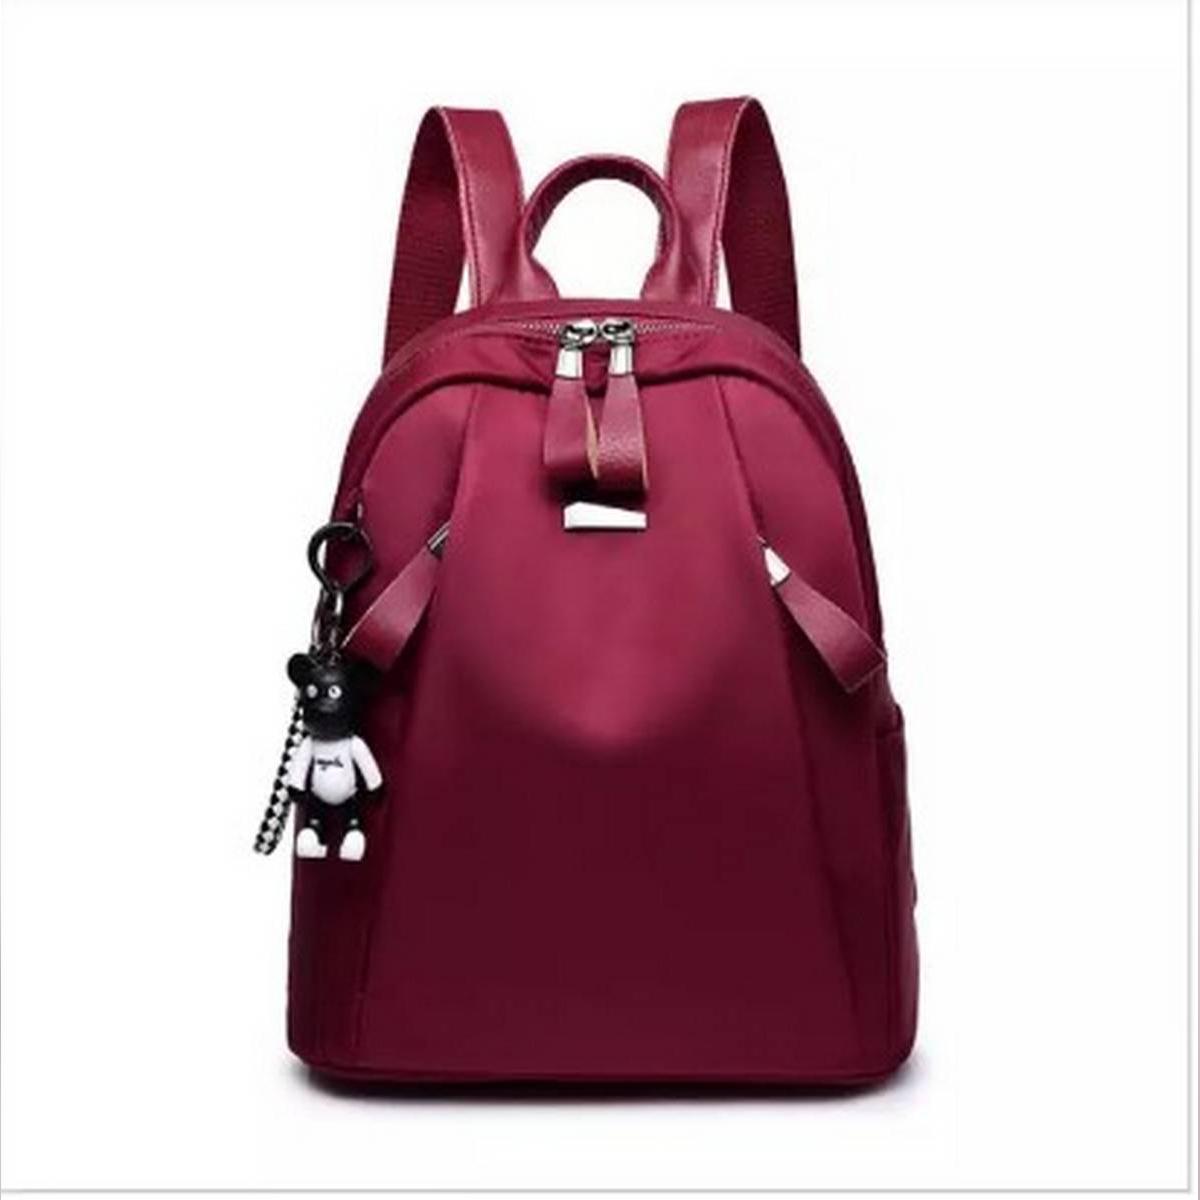 Stylish Custom Luxury Drawstring Girls College Bag, School Bag Women Daily Casual Backpack Bag